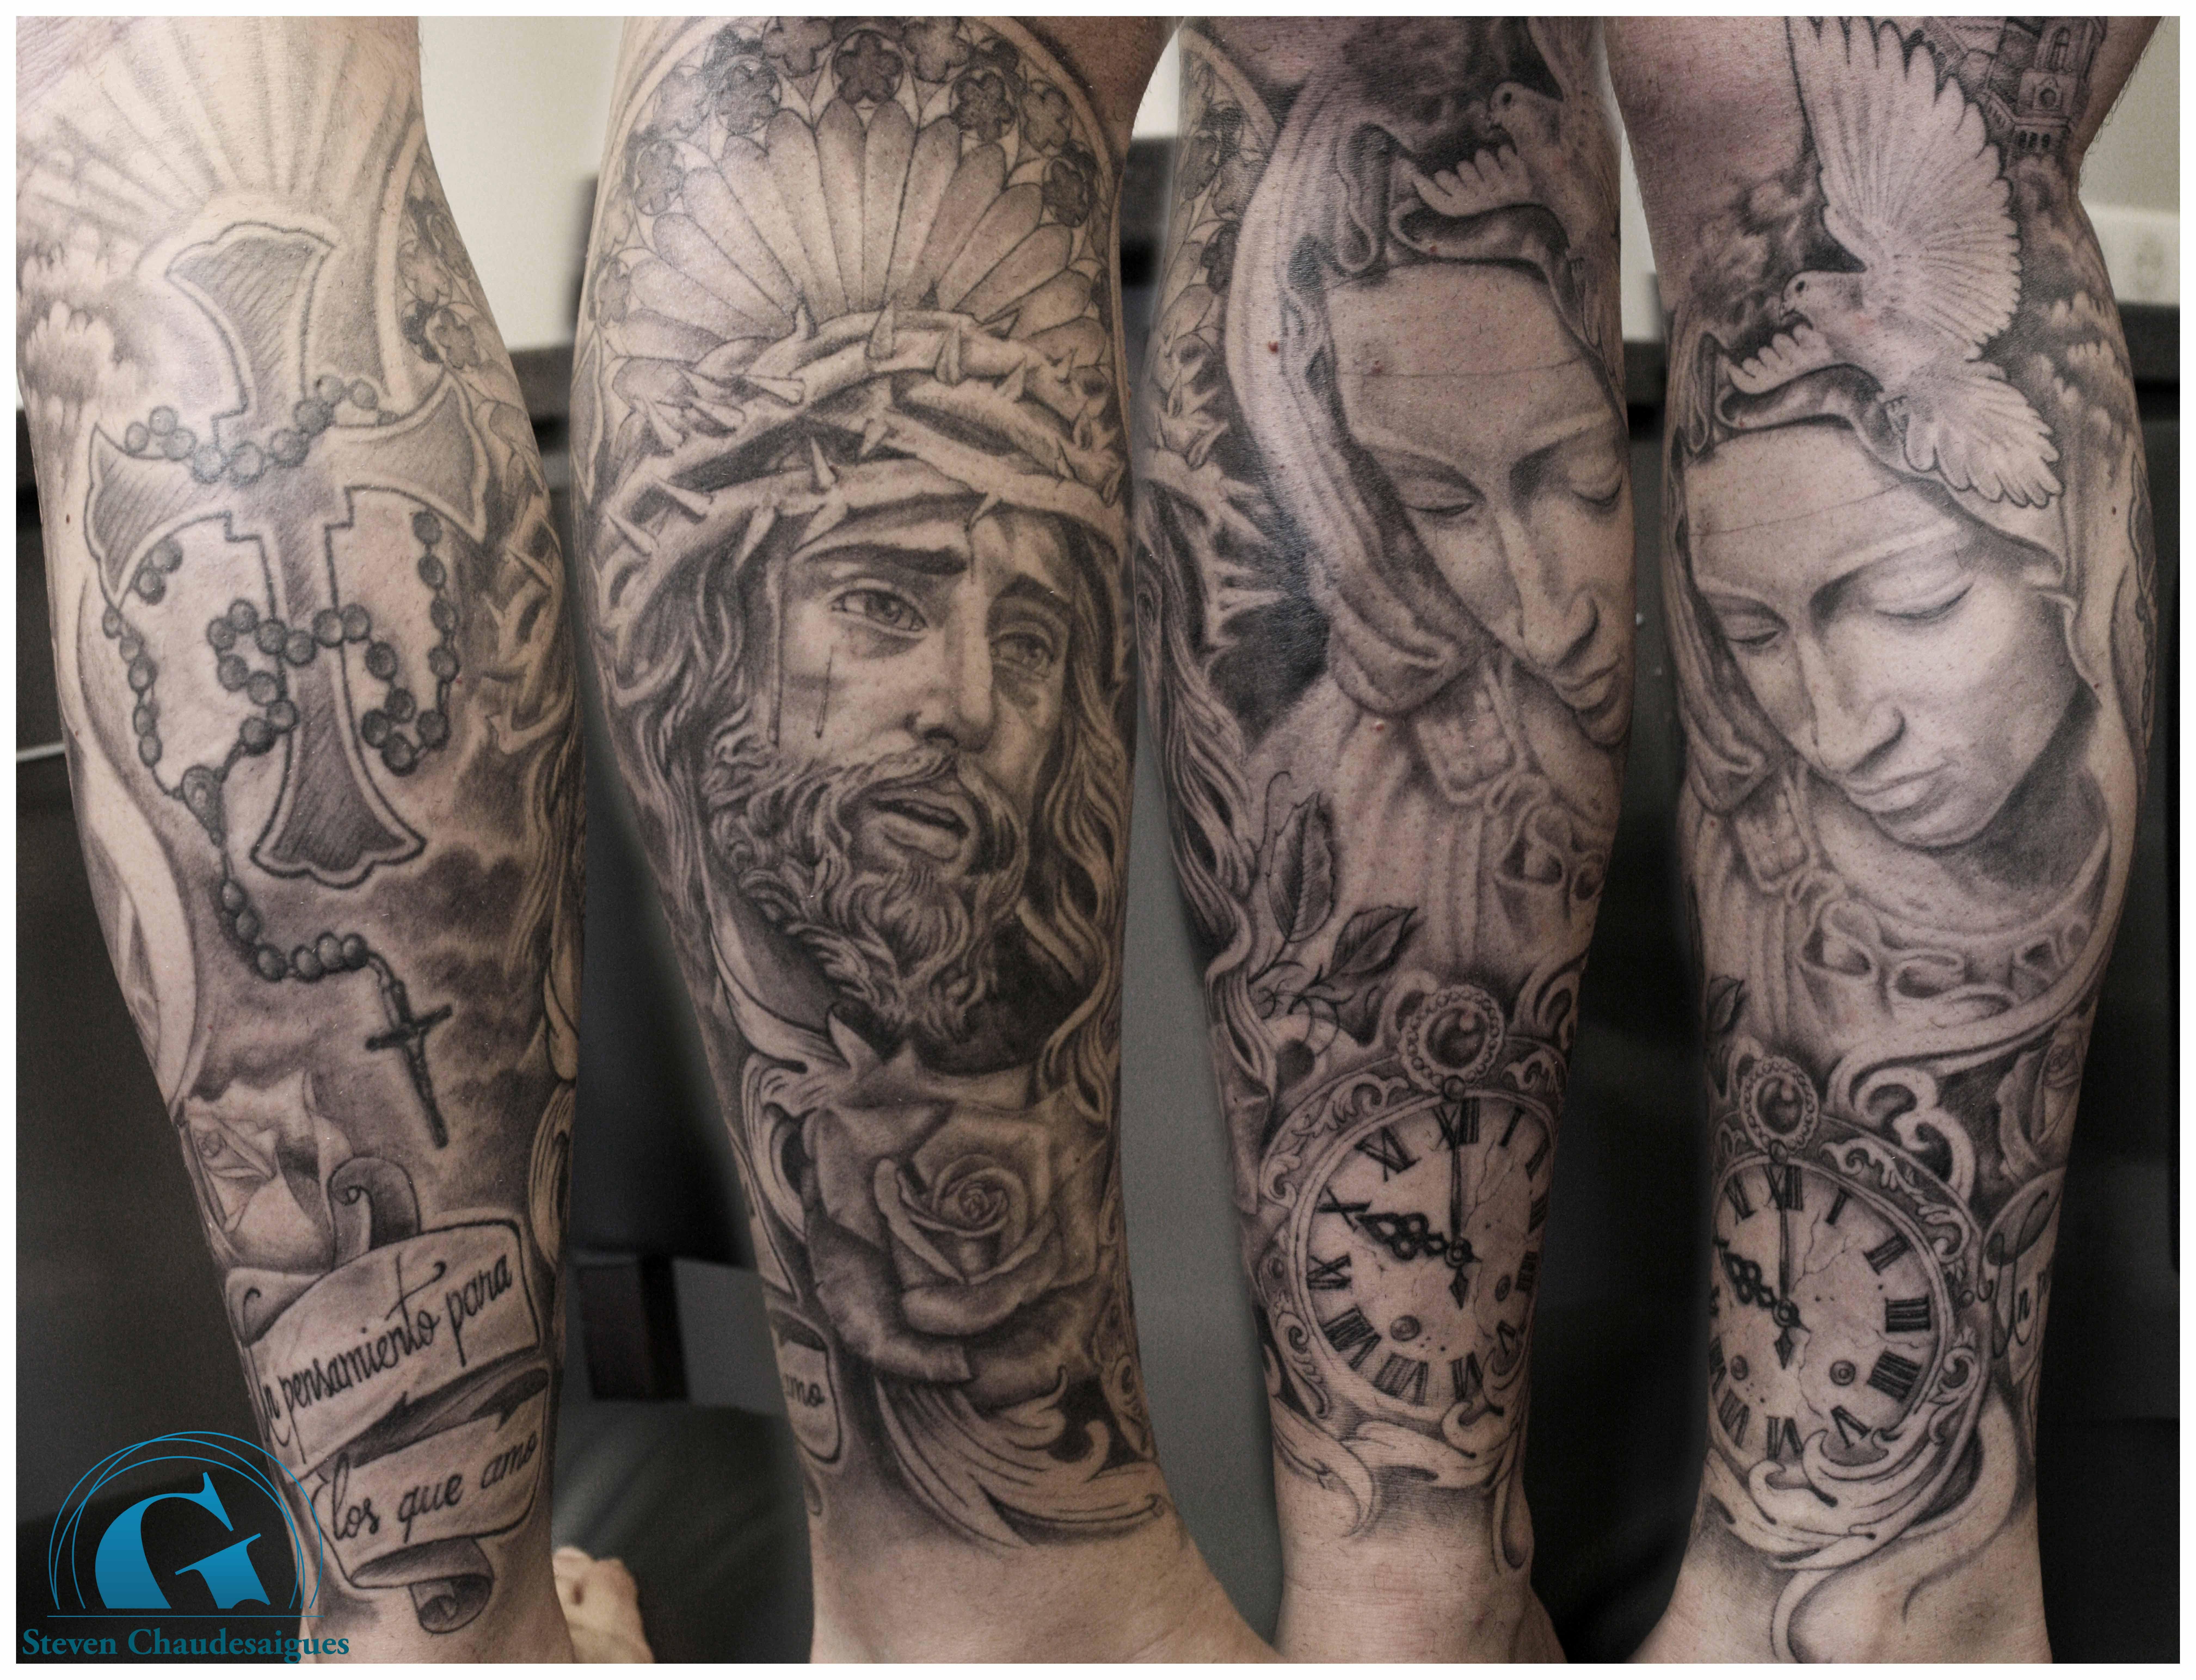 graphicaderme-avignon-steven-tatouagereligieux-stevenchaudesaigues-tatoueurfrance-tatouagemarseille-vaucluse-graphicaderme.jpg